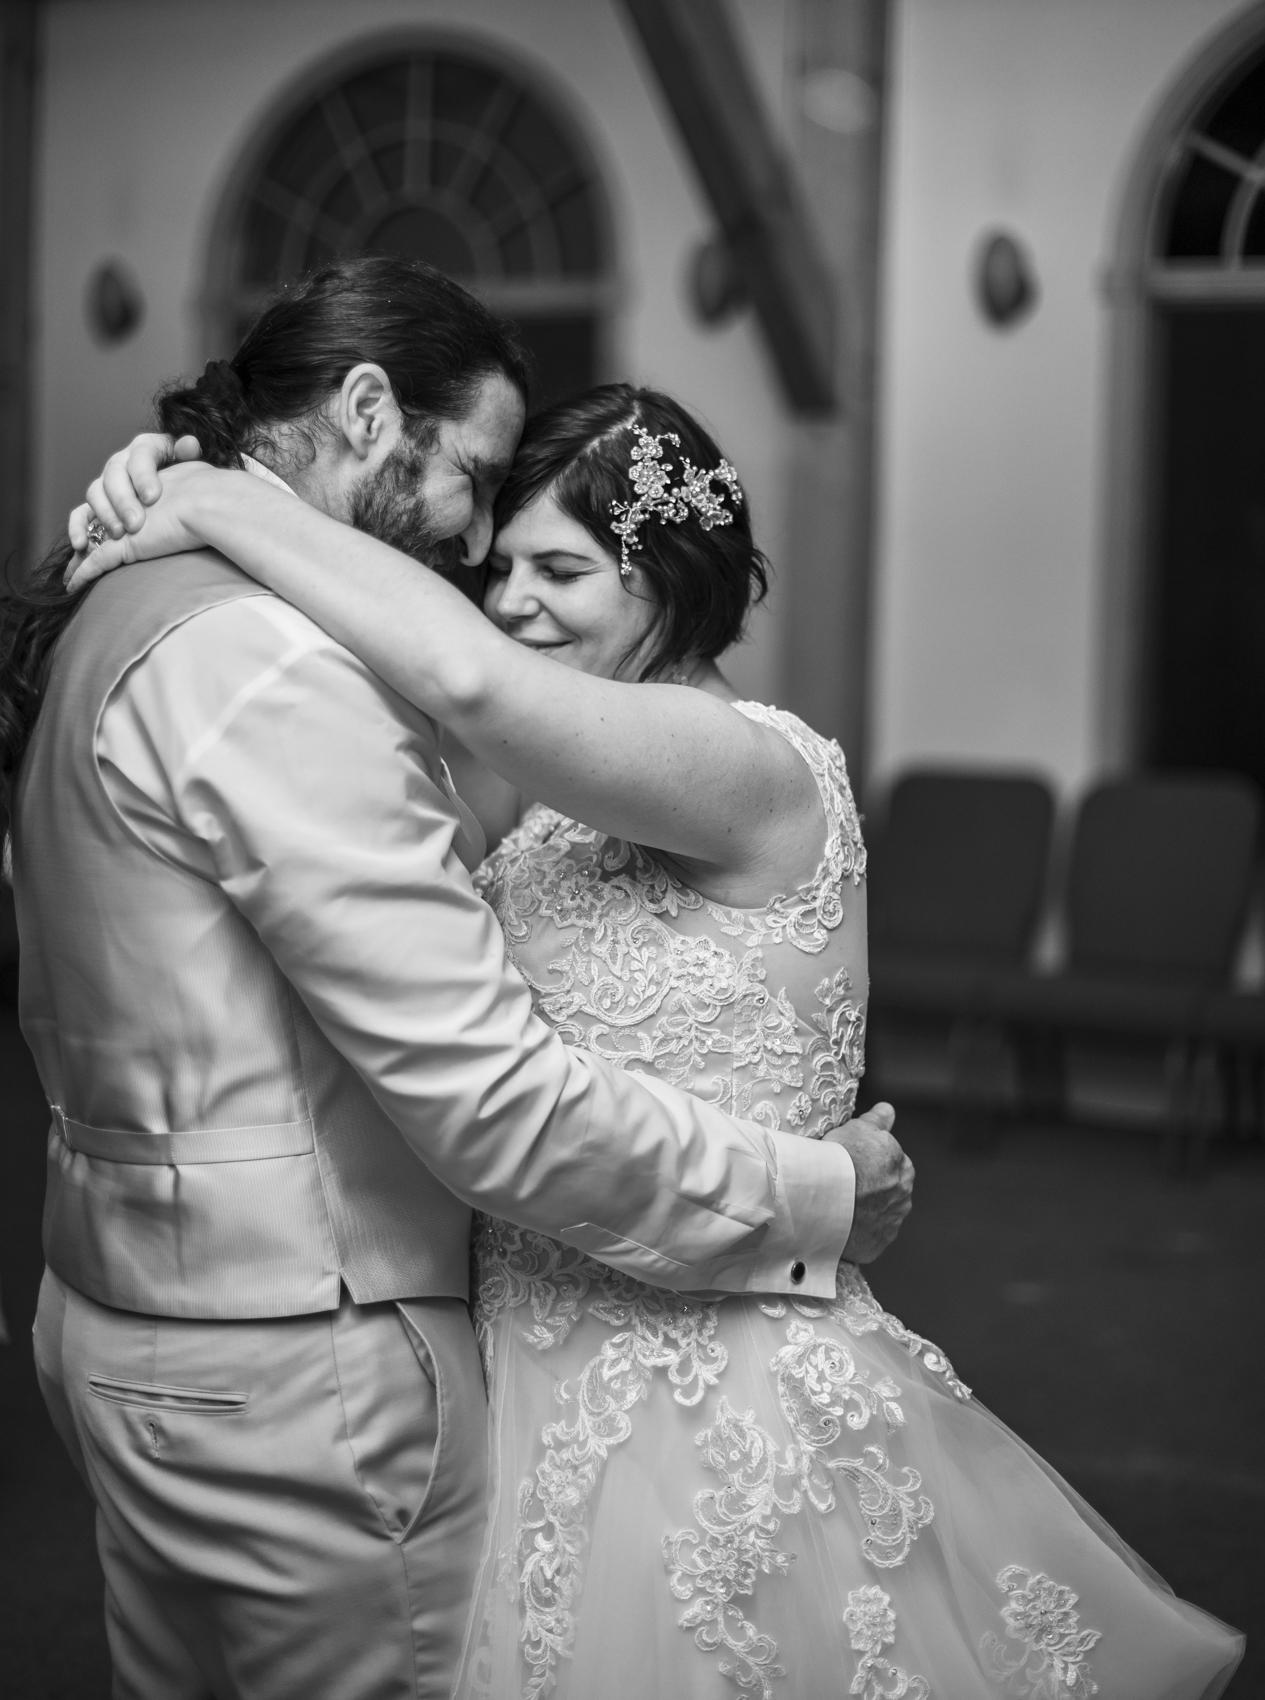 Avyanna and Phoenix Wedding- Photos by Studio Misha_BLOG-292.jpg